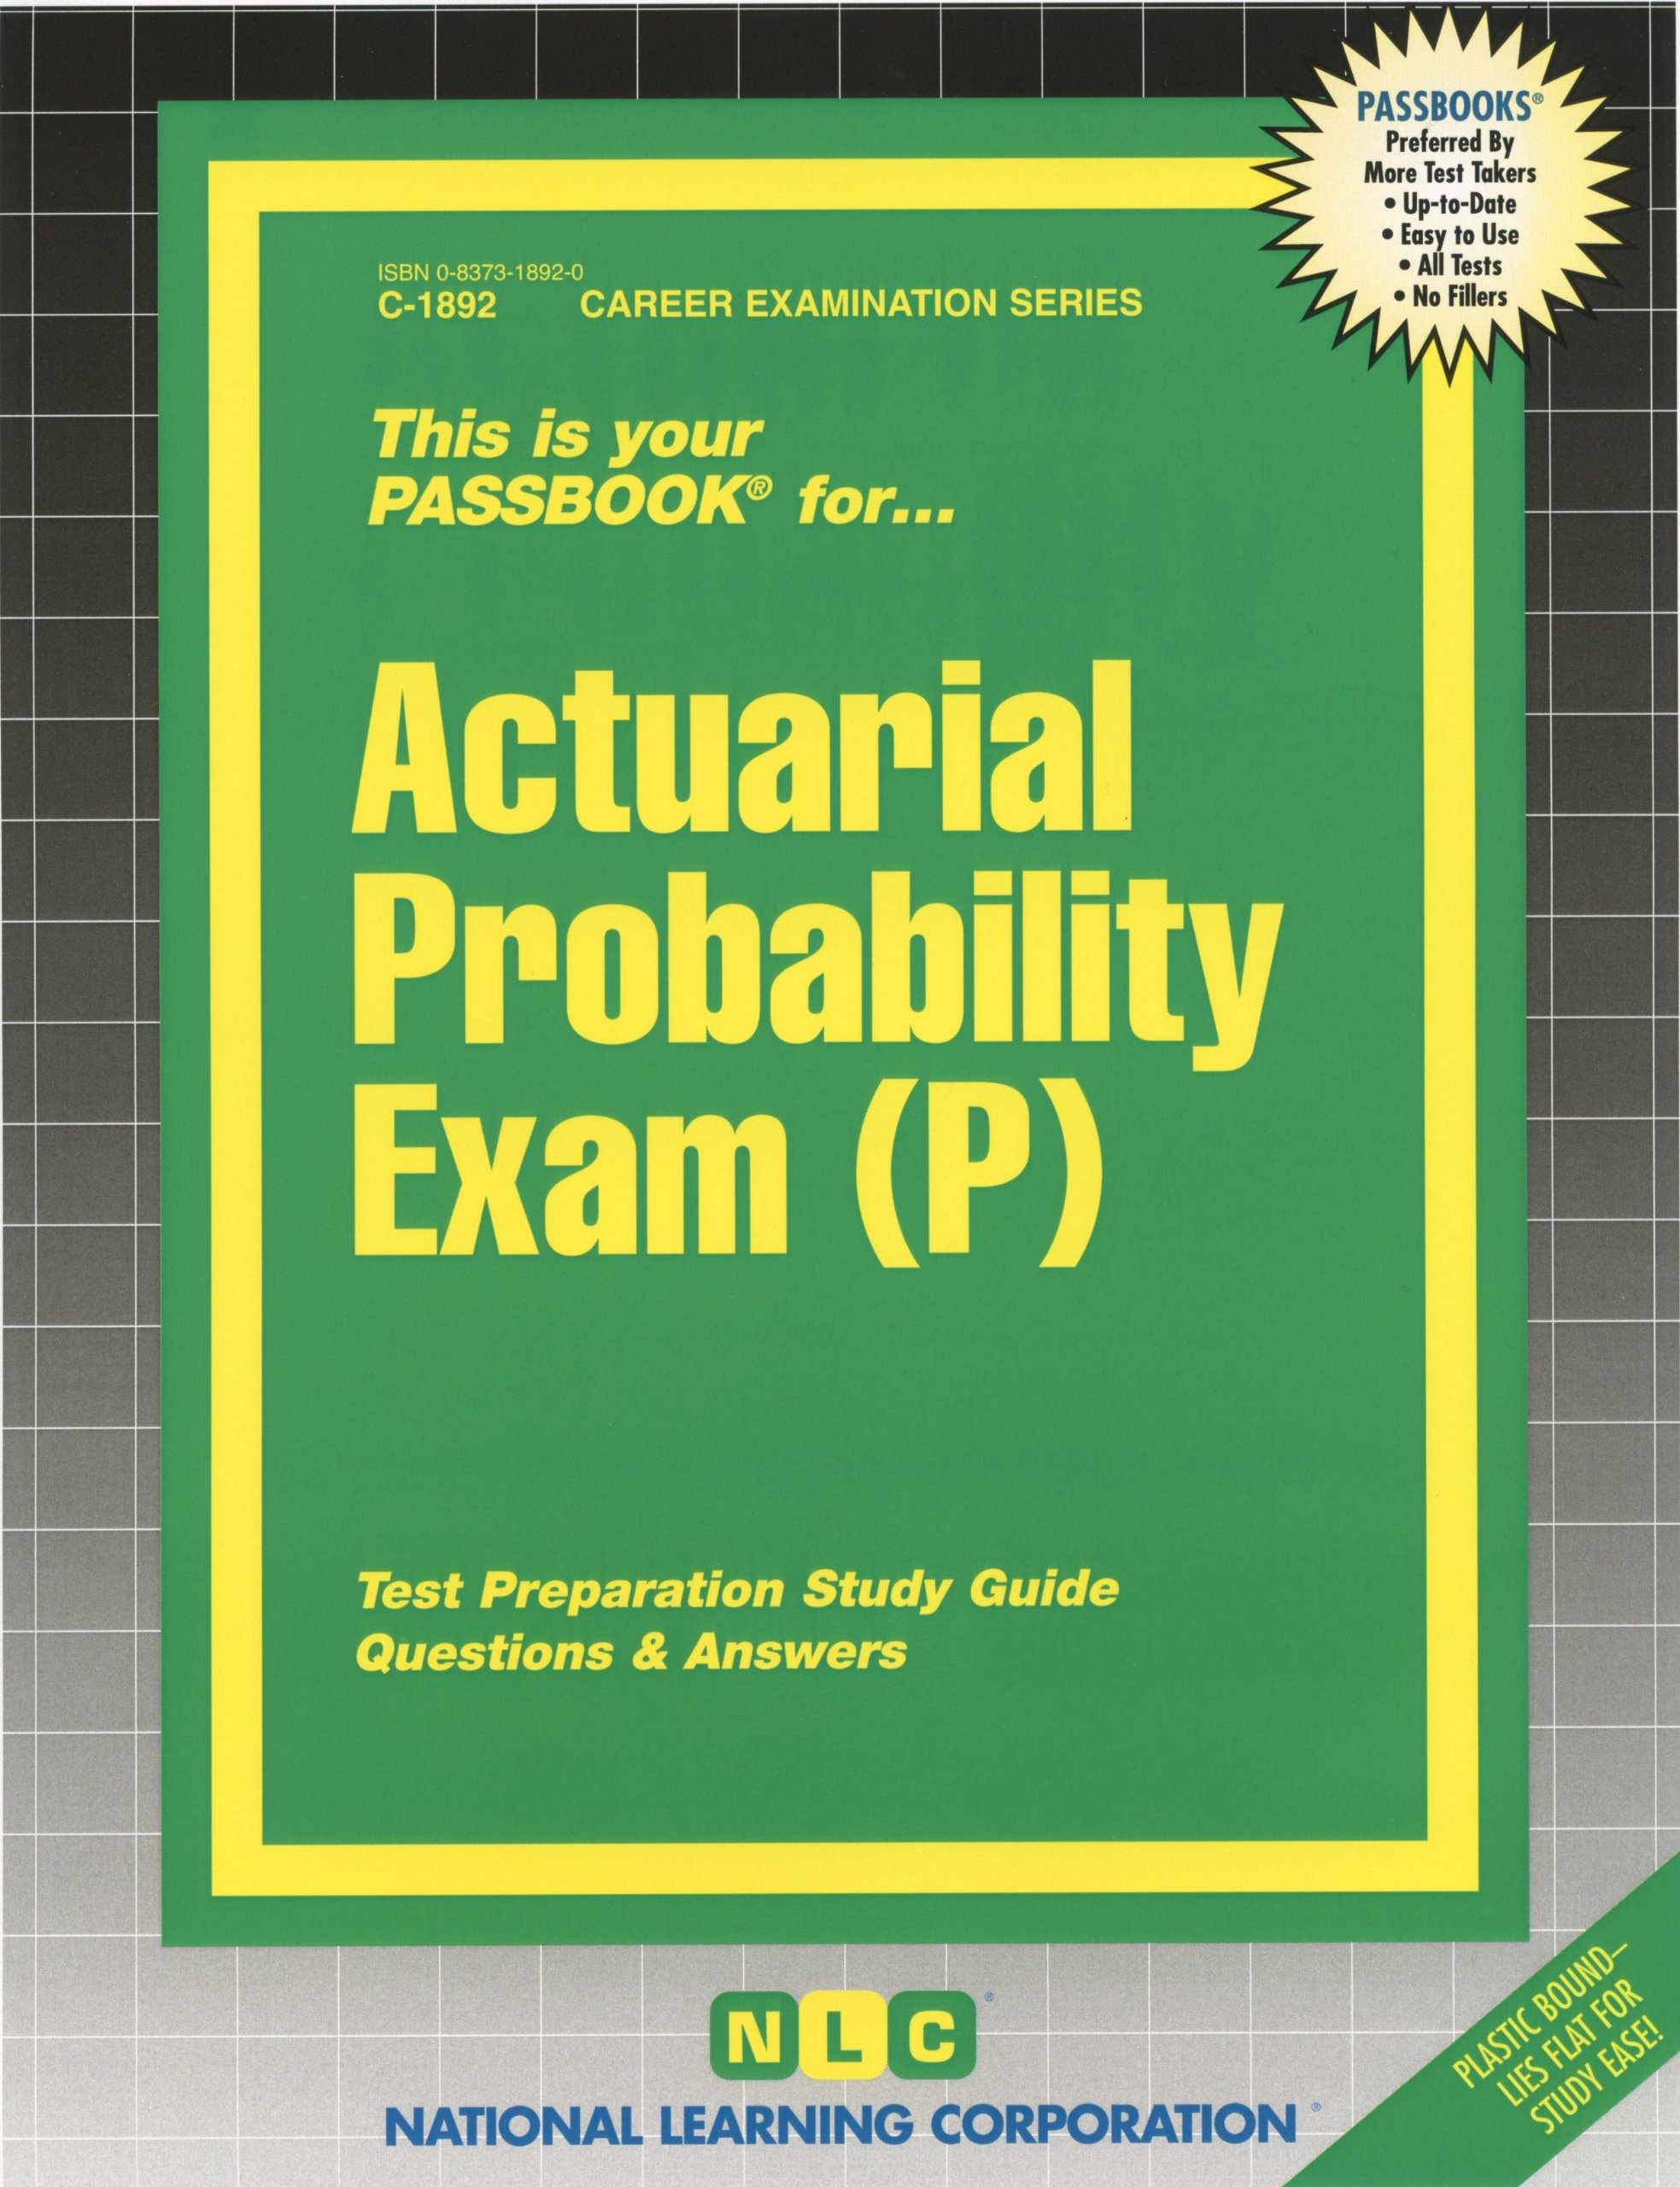 Soa exam c study guide array actuarial probability exam p passbooks passbooks 9780829318920 rh fandeluxe Image collections